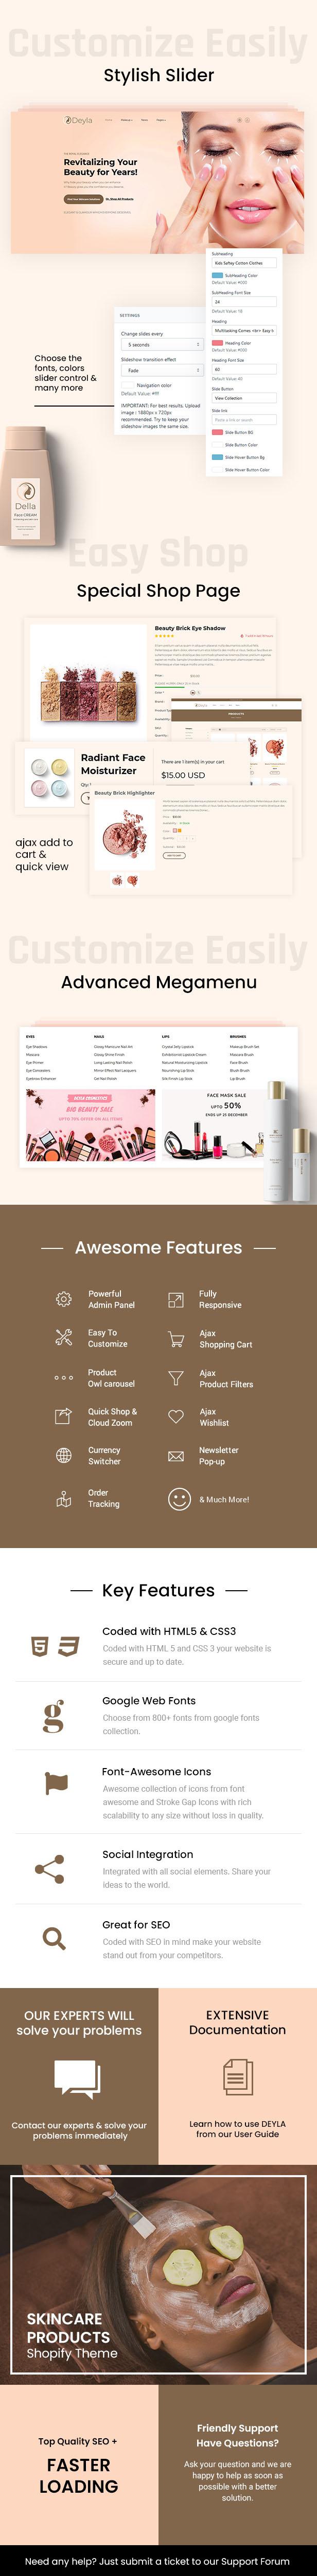 Deyla - Beauty and Cosmetics Store Shopify Theme - 1